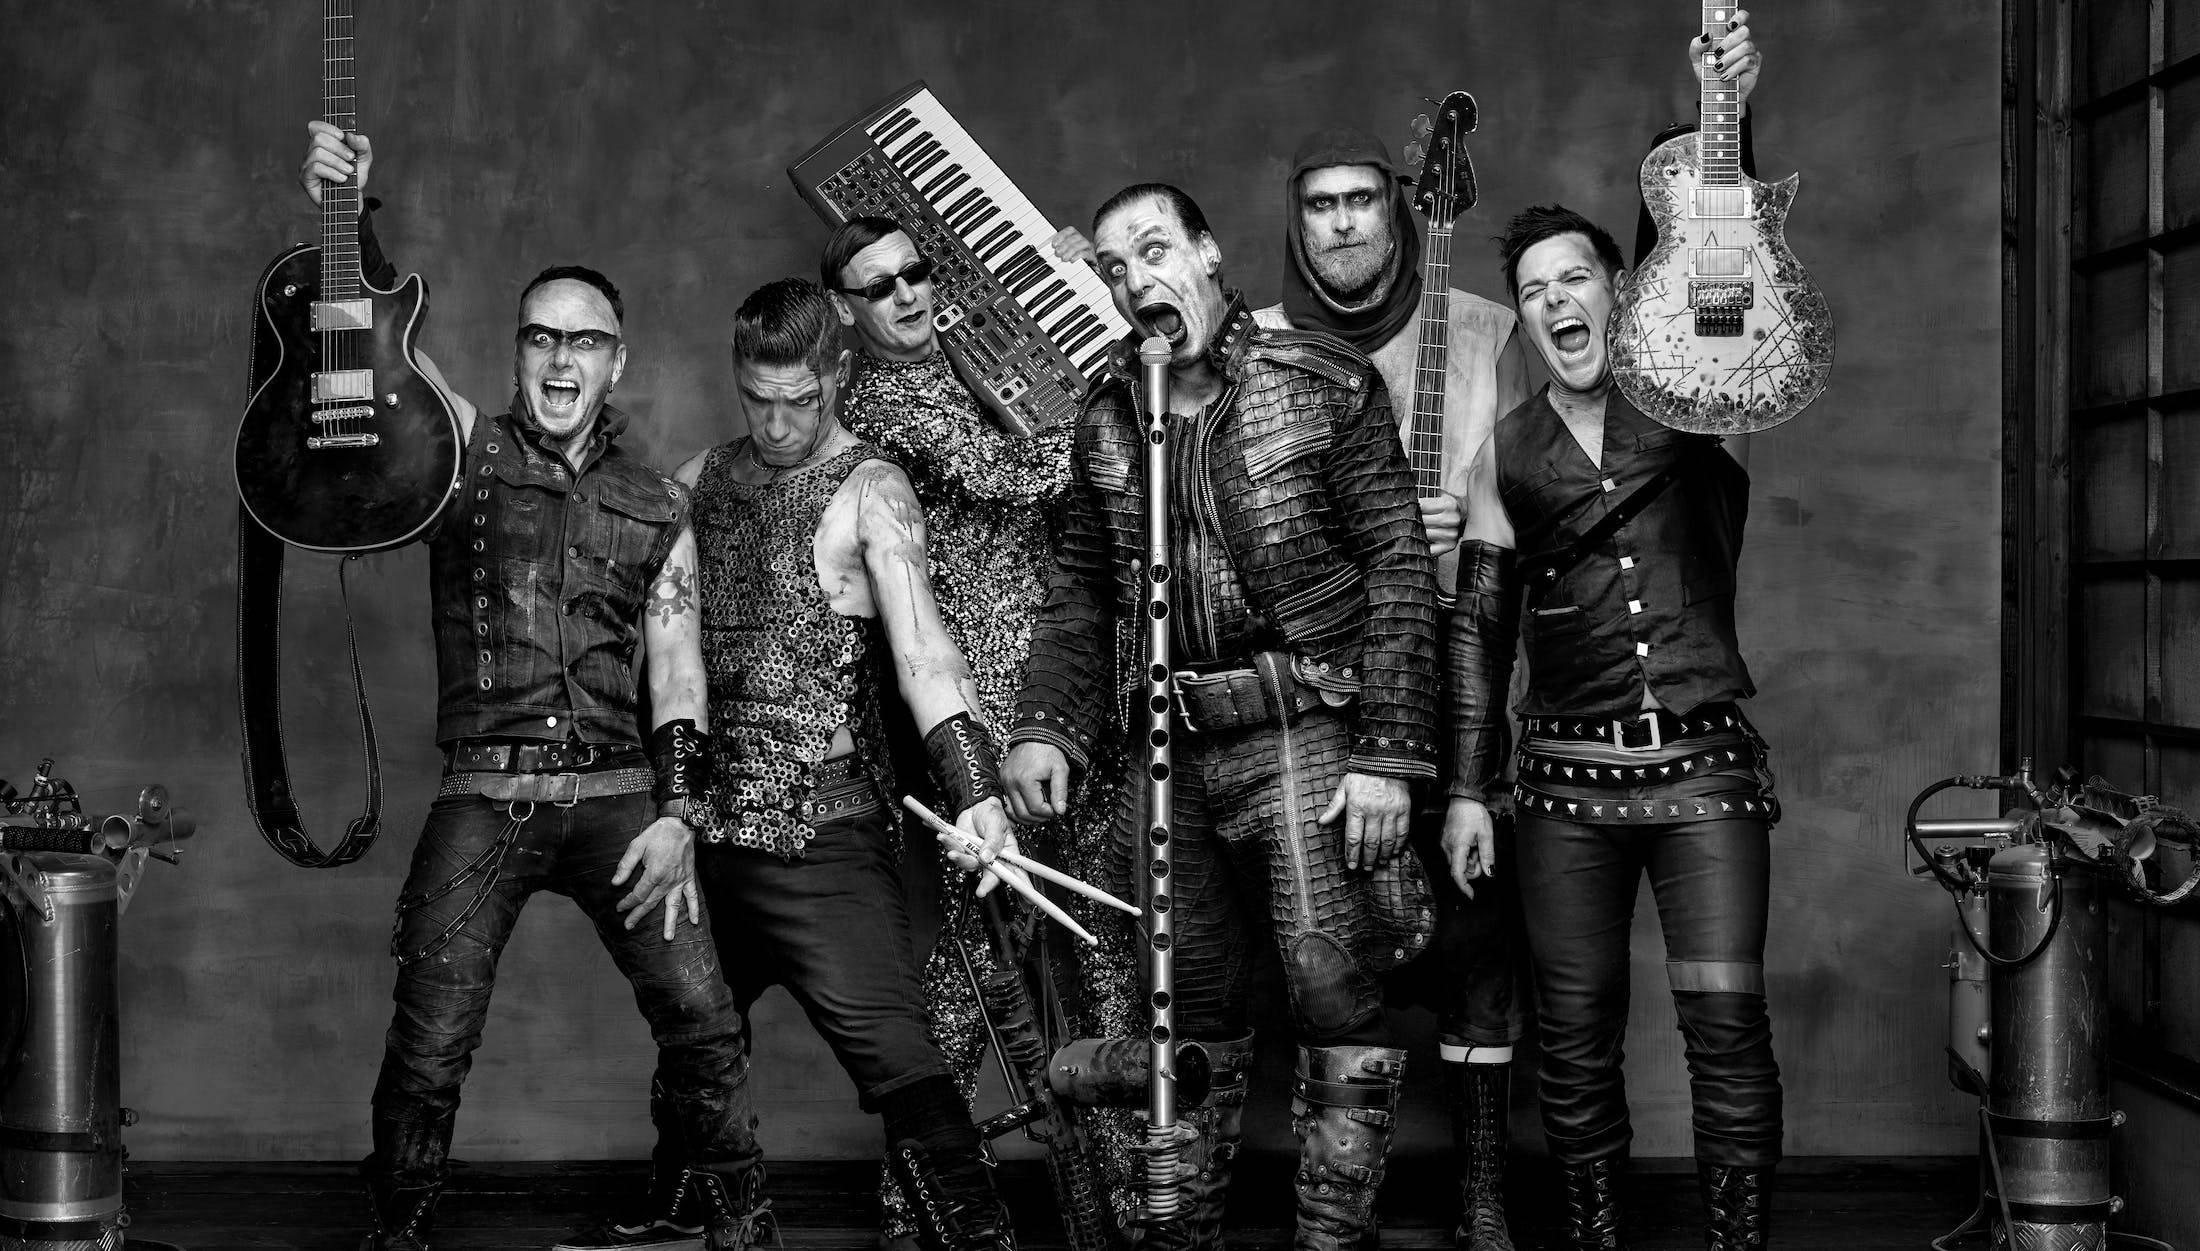 L'histoire du groupe de metal Rammstein